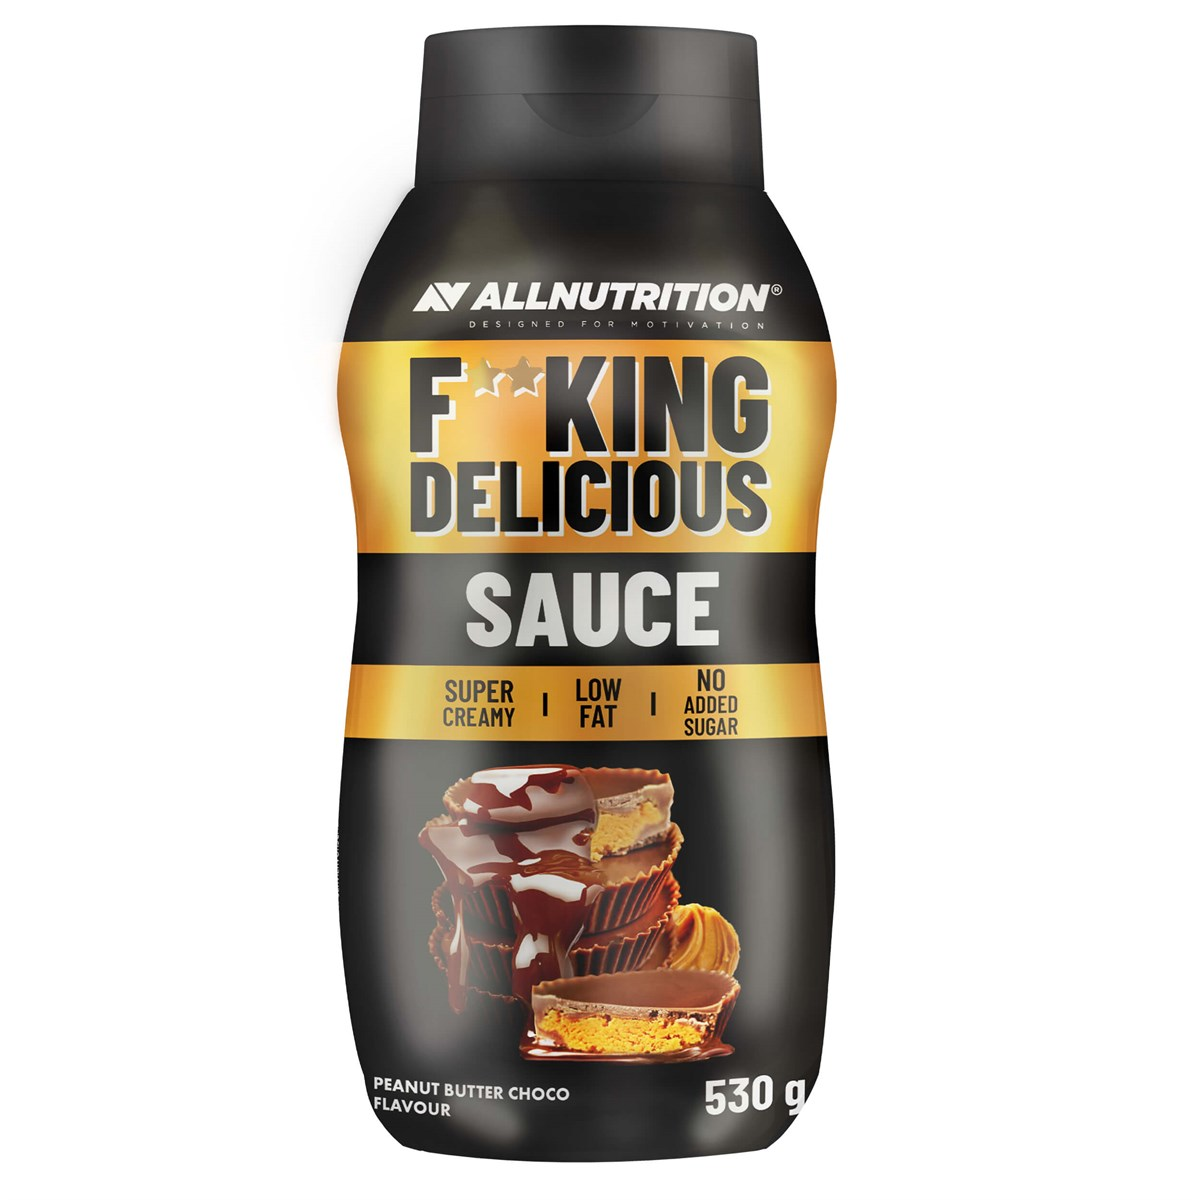 F--king Delicious Sauce Allnutrition